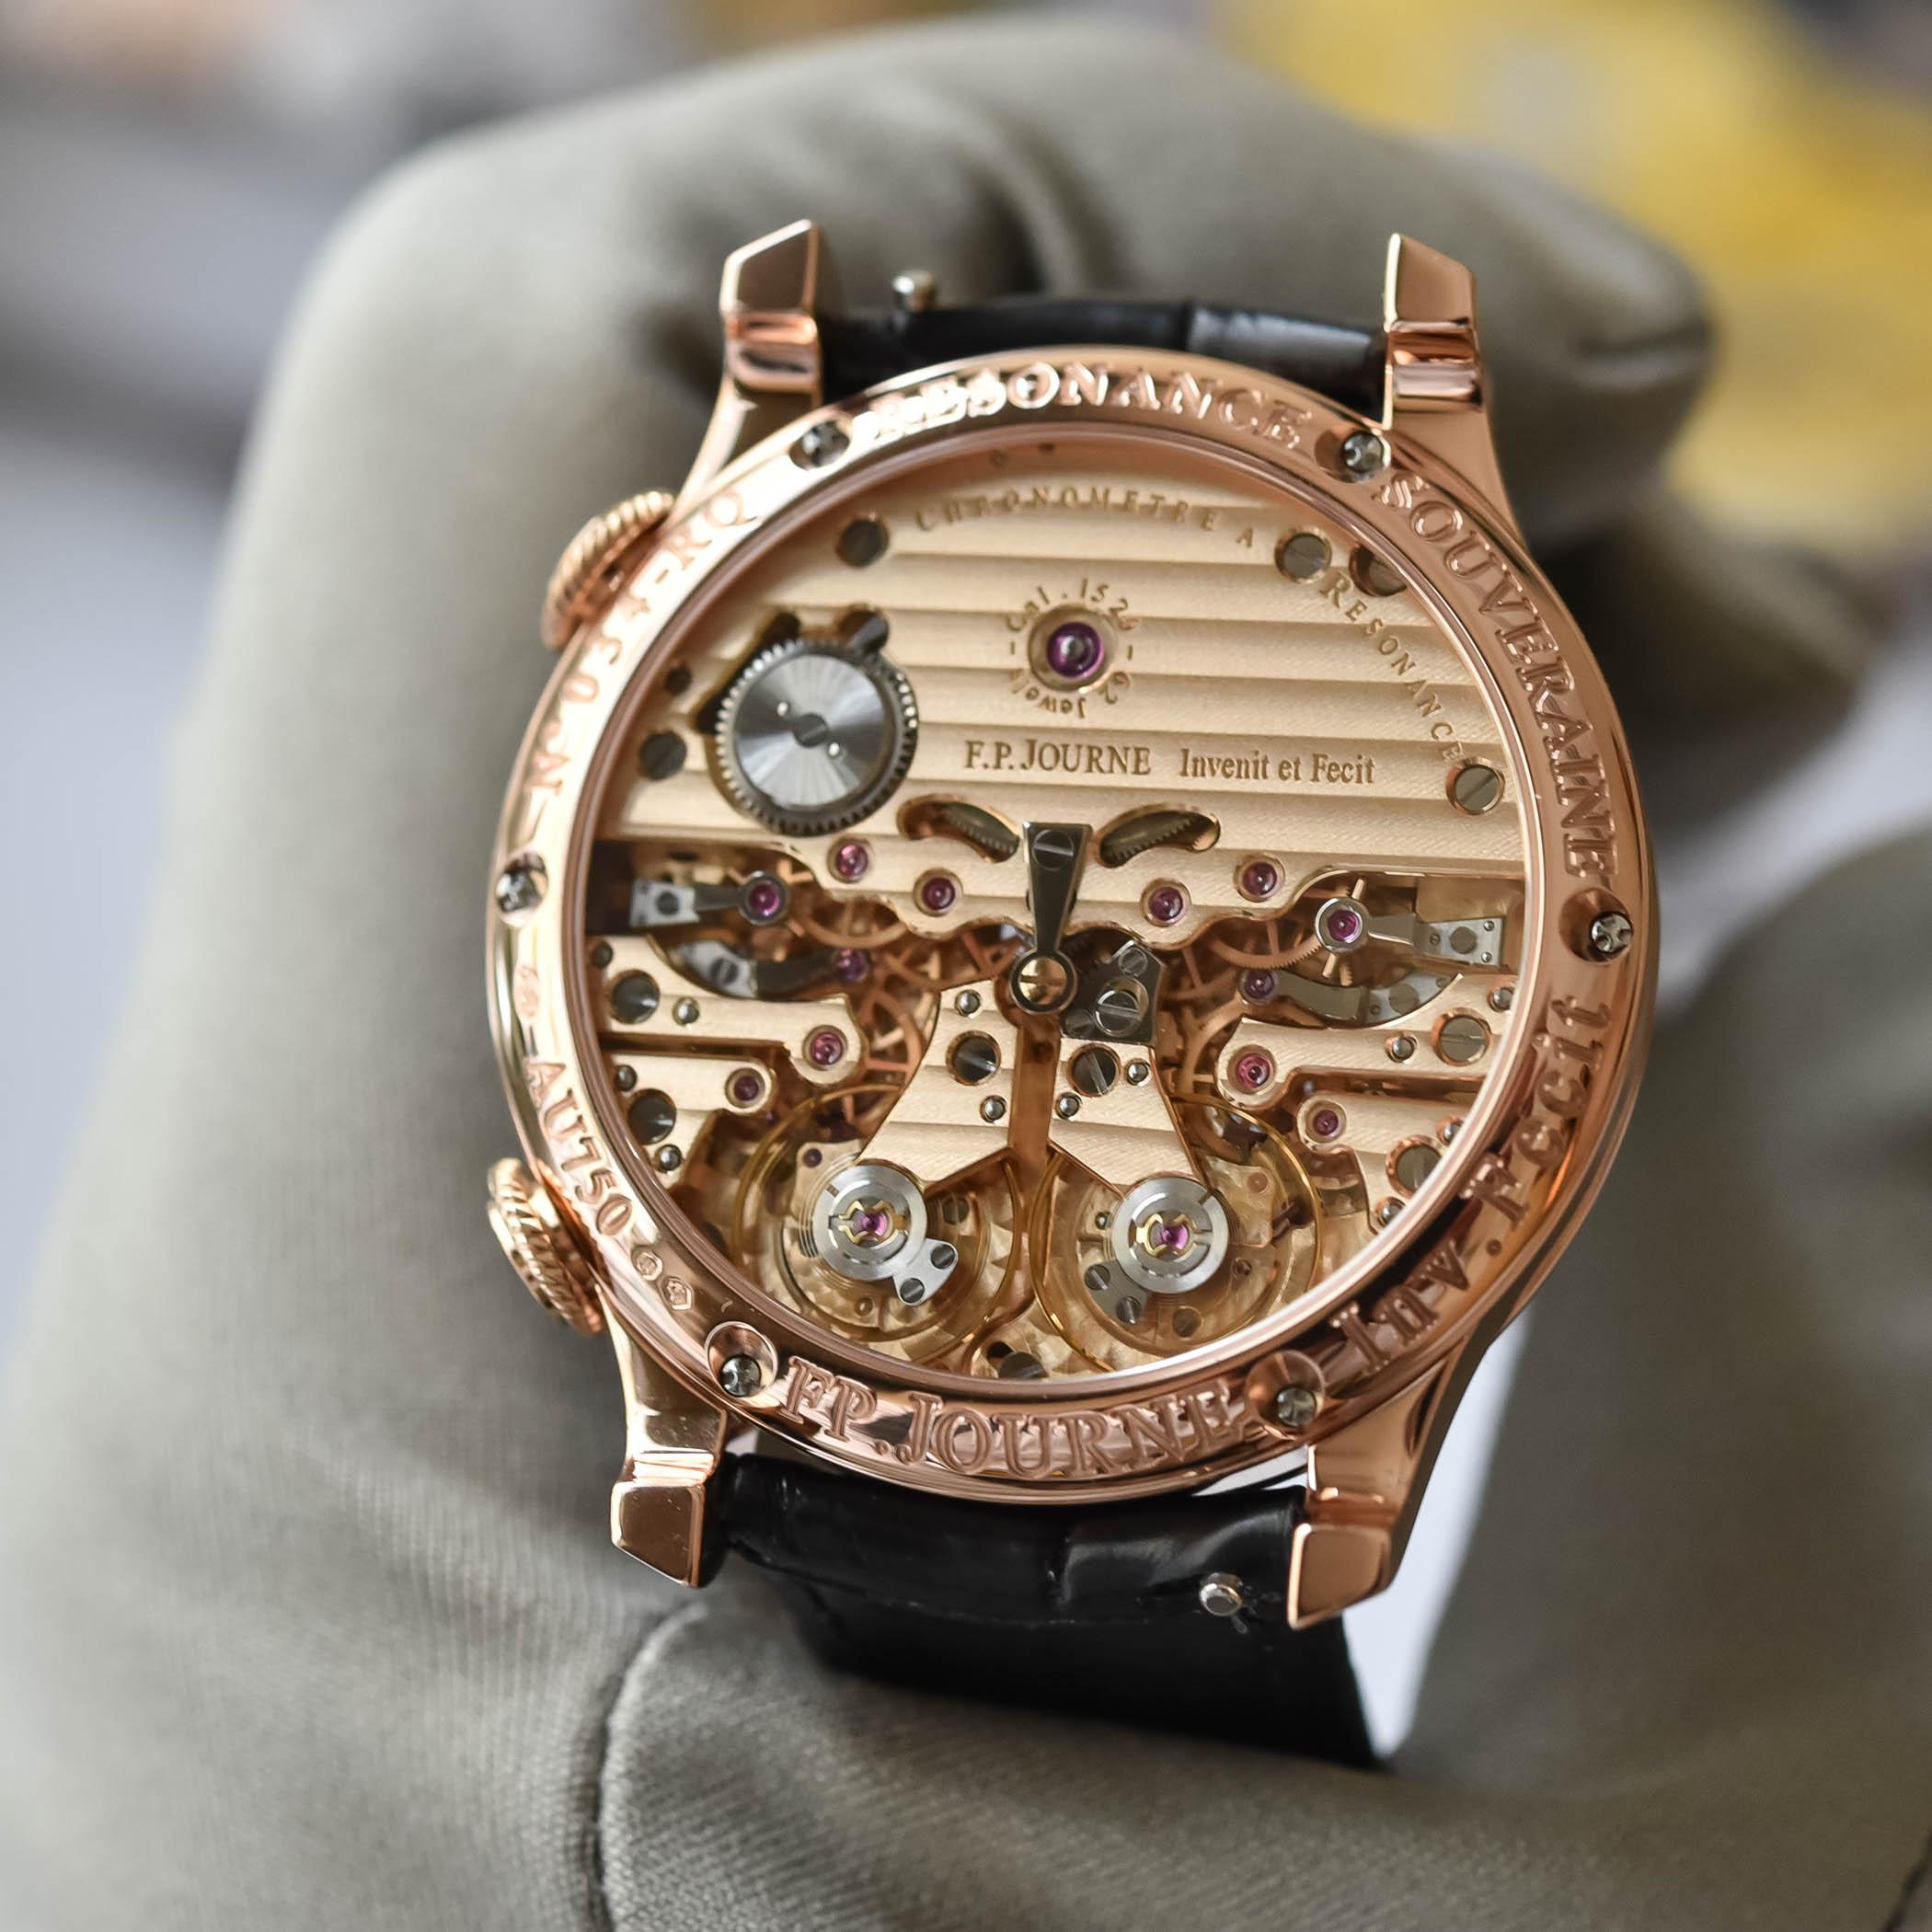 F.P. Journe Chronometre a Resonance Twin Remontoirs d'Egalite